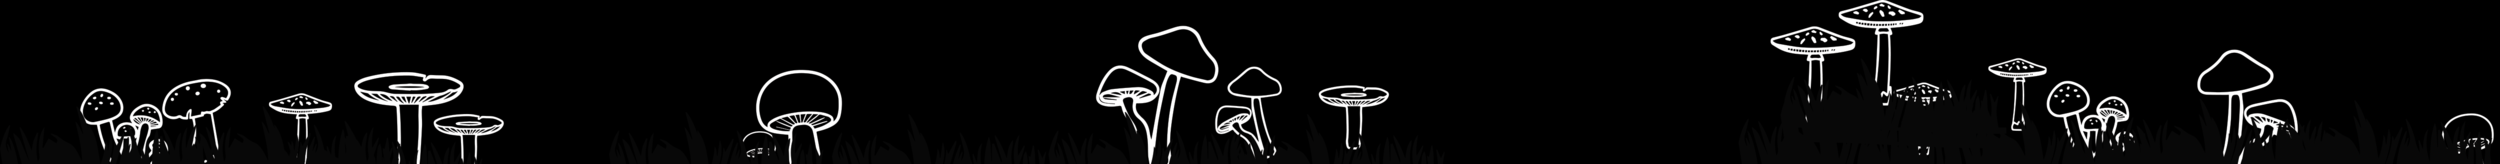 hsssn_mushroom_bottom.png